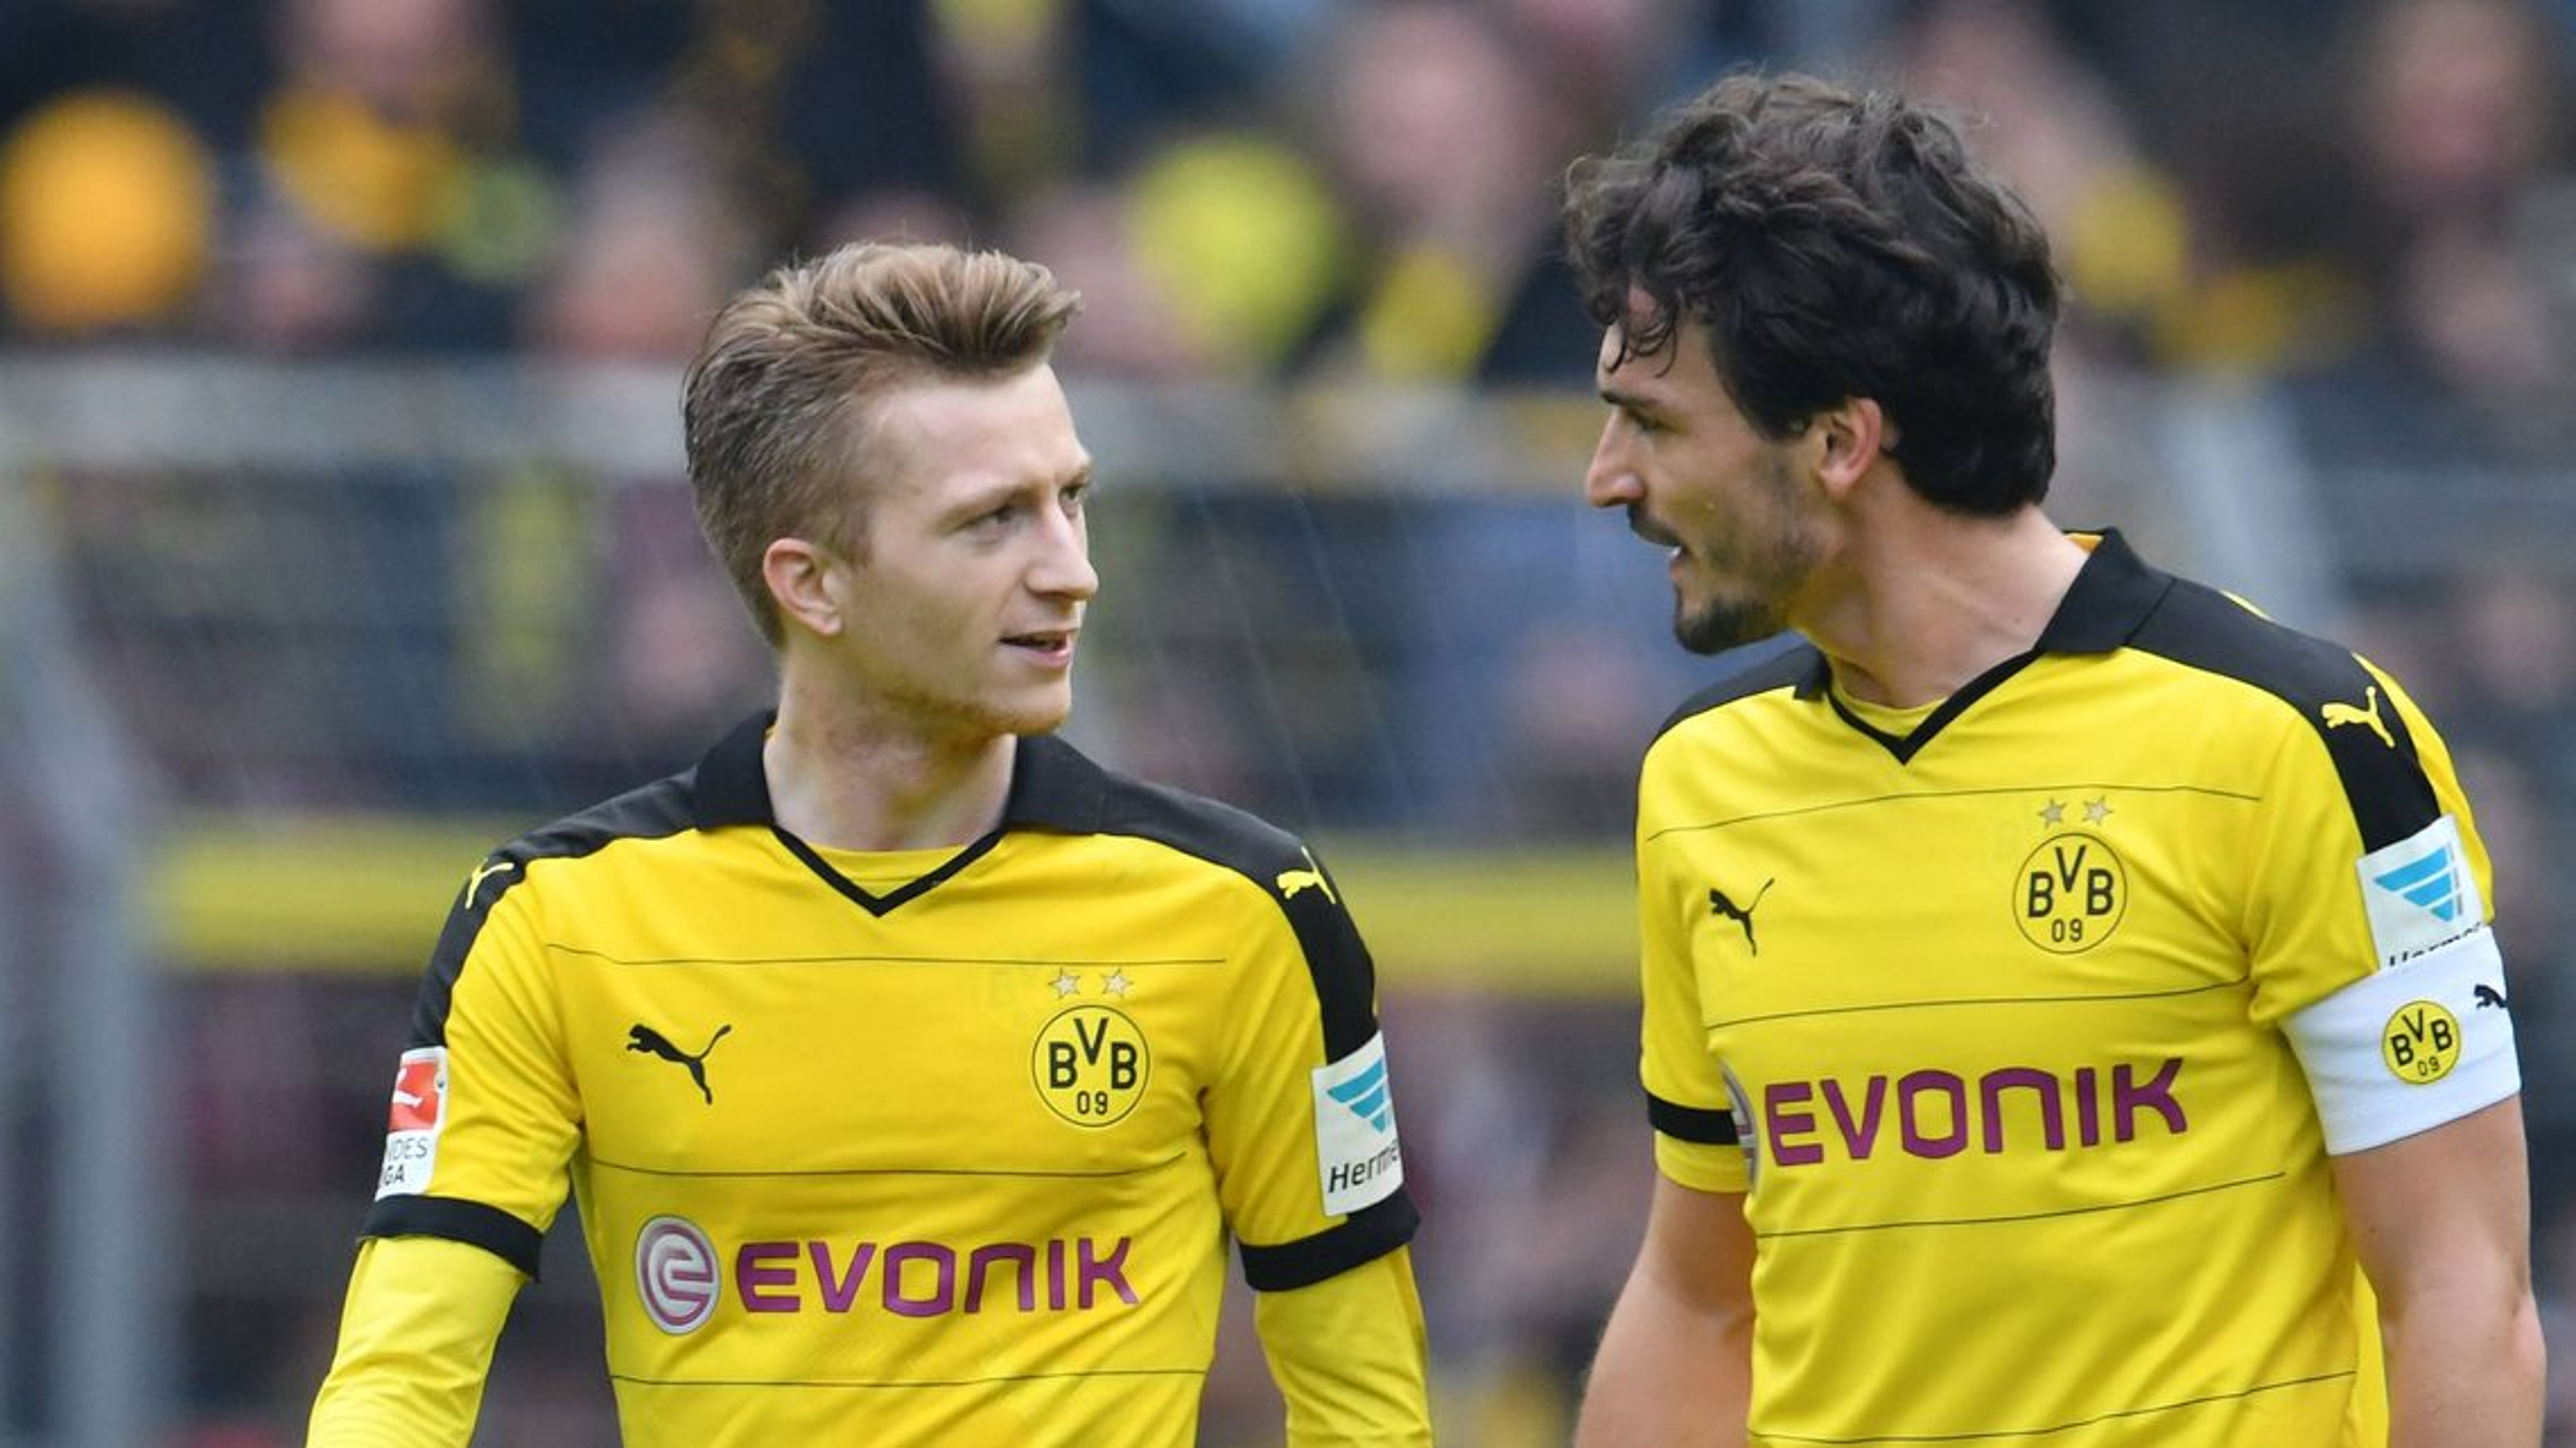 hot sale online ff758 76f14 Bundesliga | Borussia Dortmund: No place like home for Mats ...